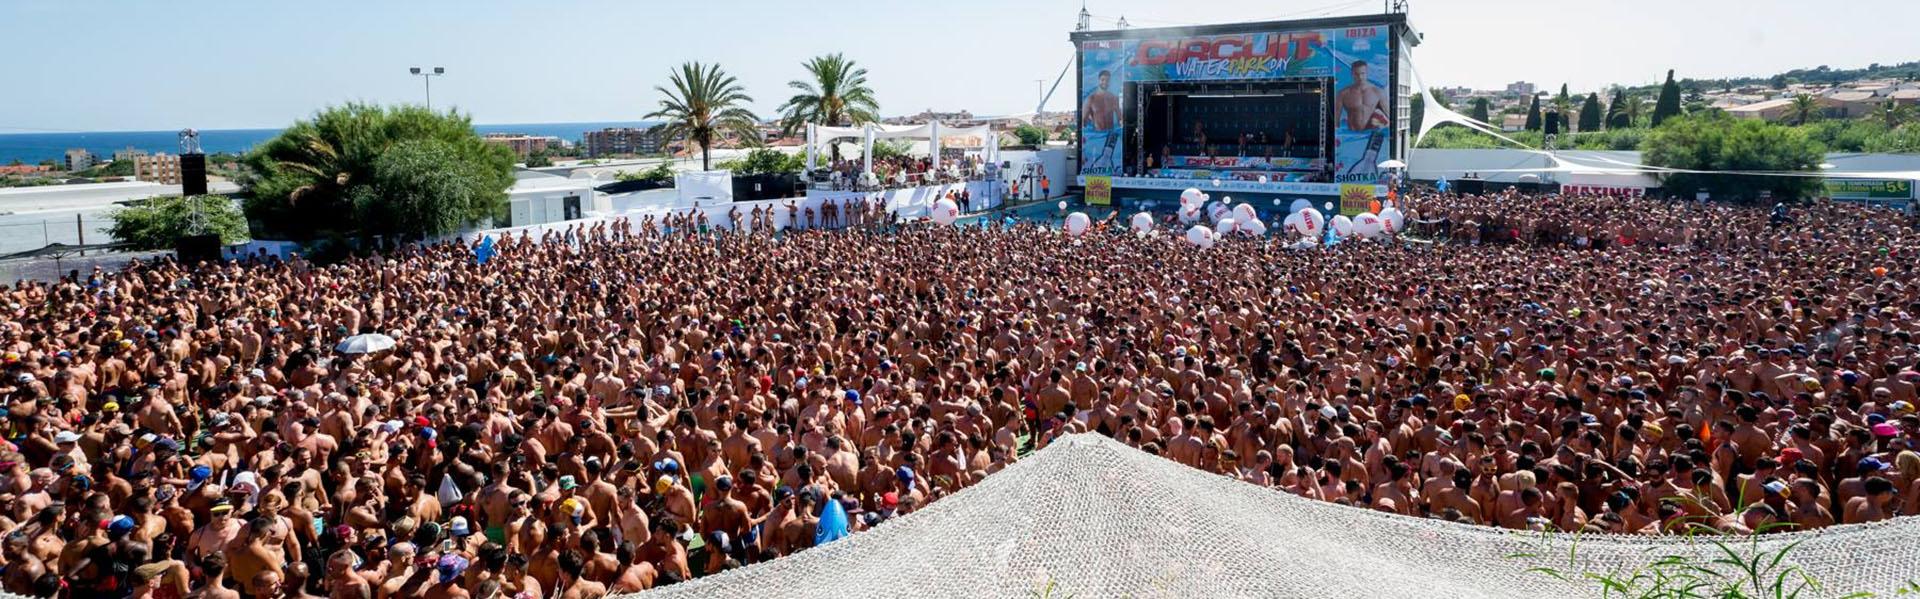 waterpark-girlie-festival-circuit